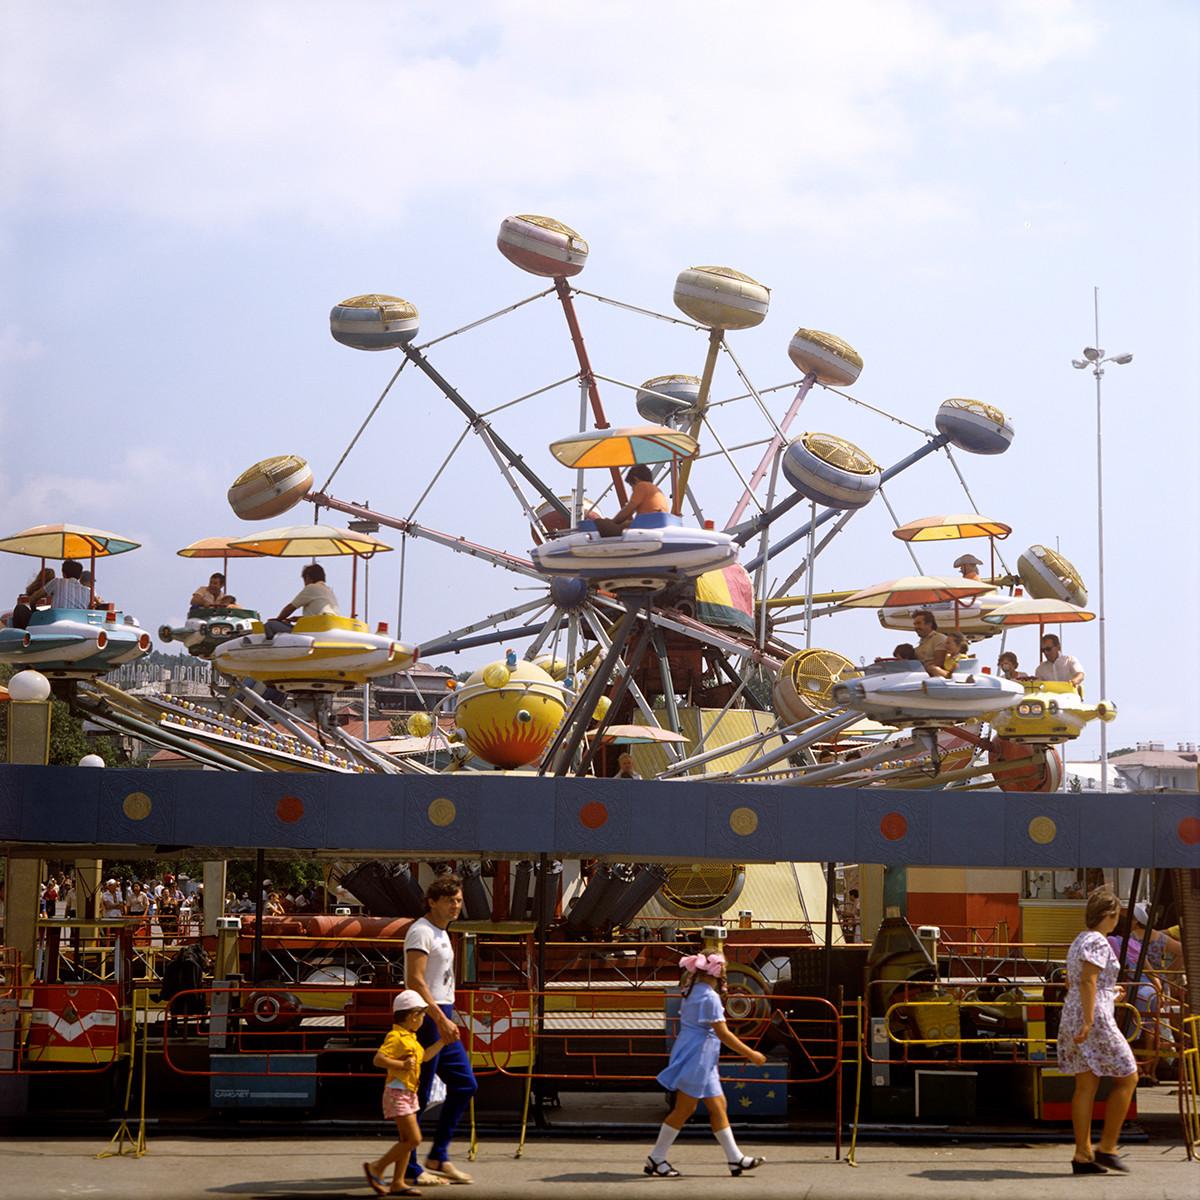 Jaлта, 1981.